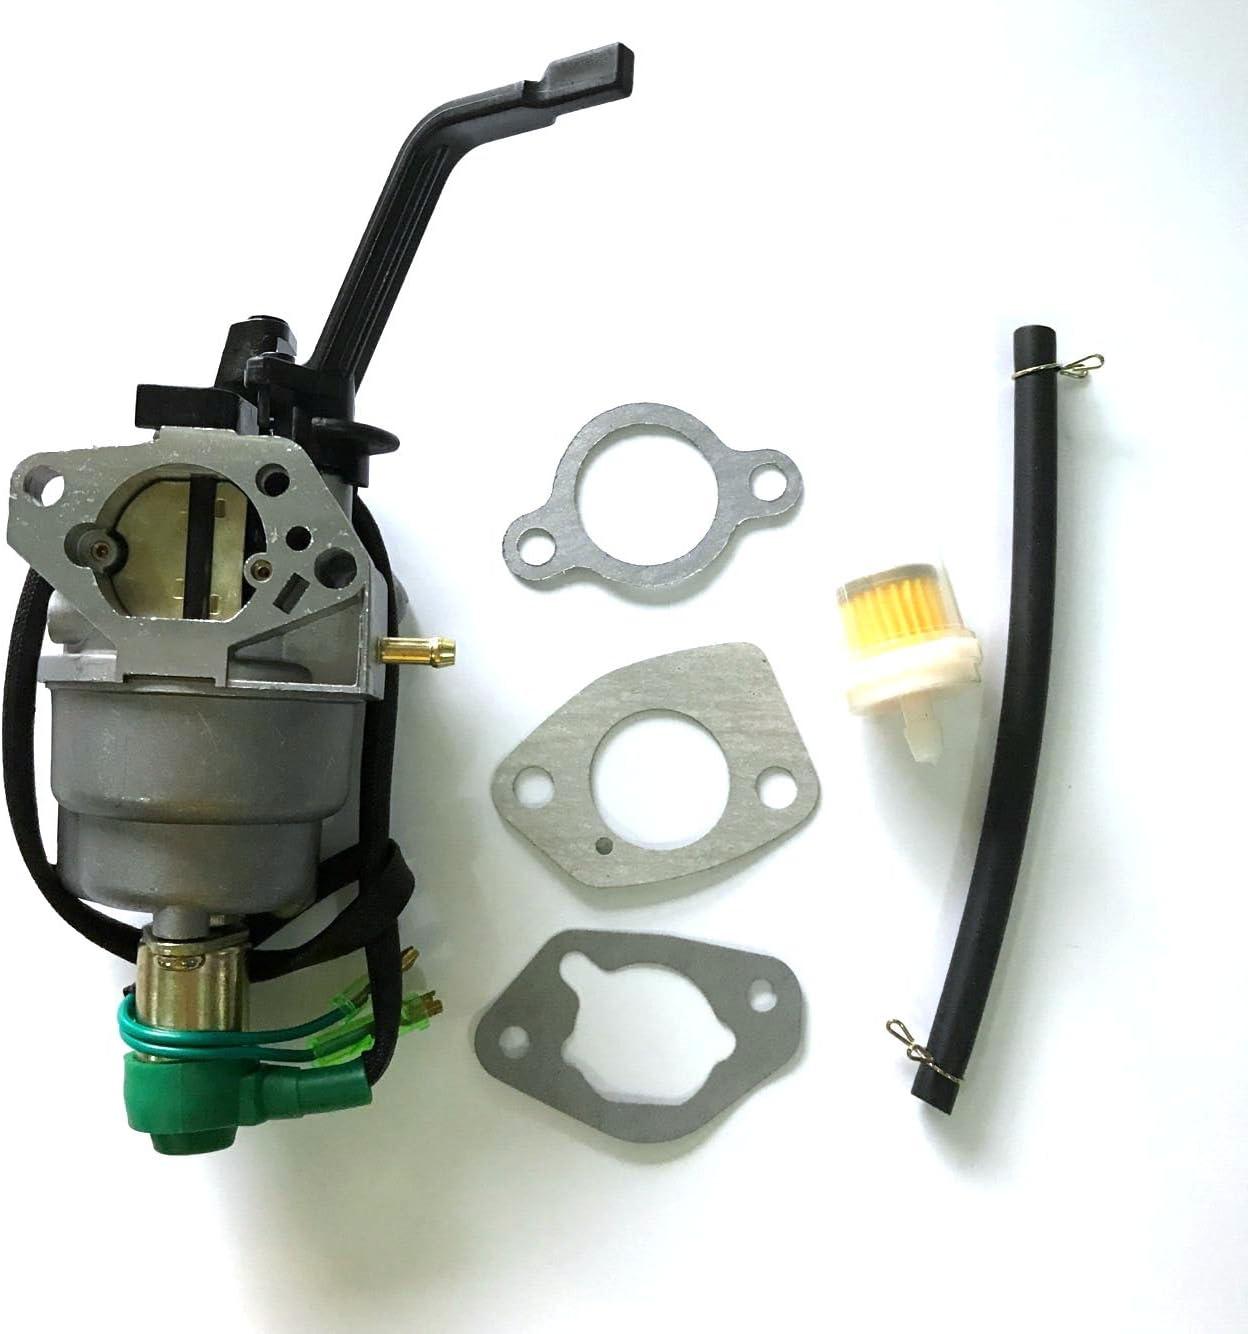 Amazon.com : HQ parts Manual Carburetor & Fuel Filter for GENERAC GP6500  GP6500E GP7500E GP5500 8125W Generator : Garden & Outdoor